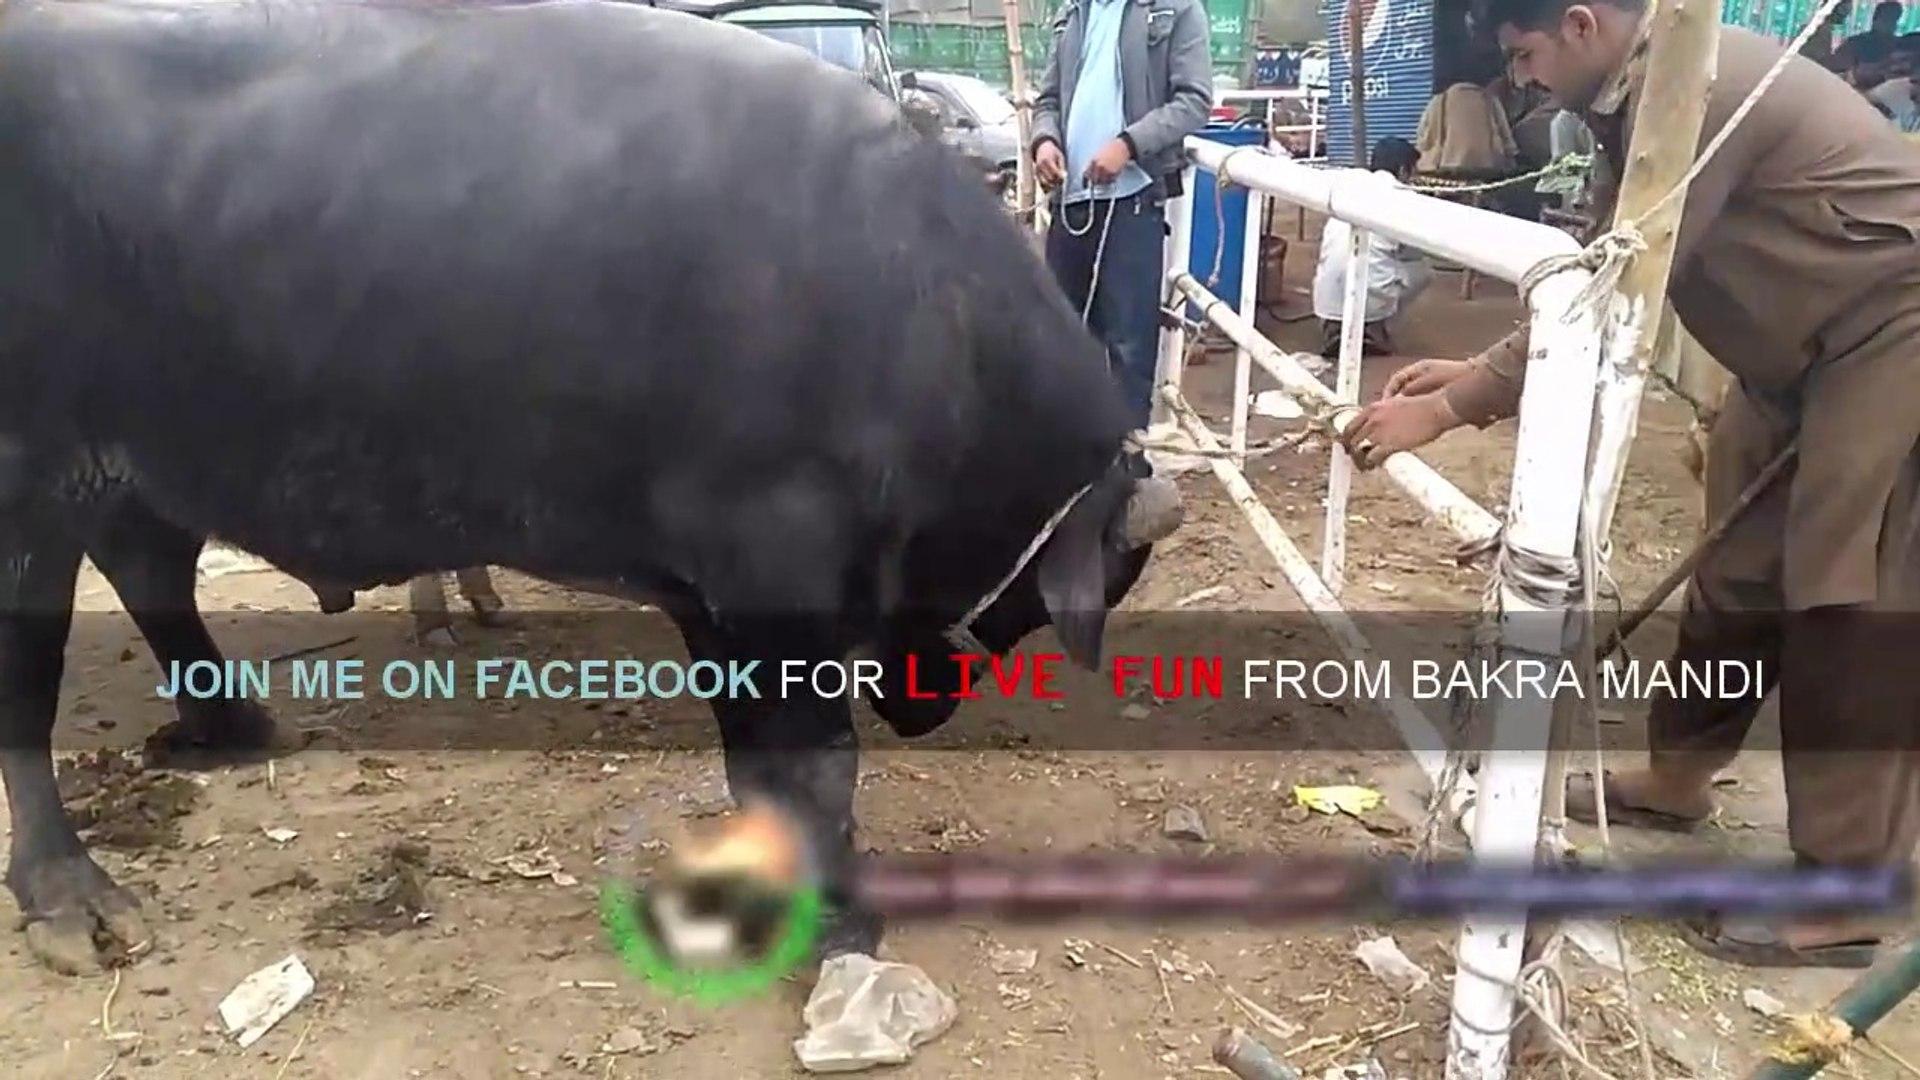 Sanda Qurbani 2017 Lahore Mandi Maveshi Shahpur Kanjra - BakraEid in  Pakistan Cow Mandi Video